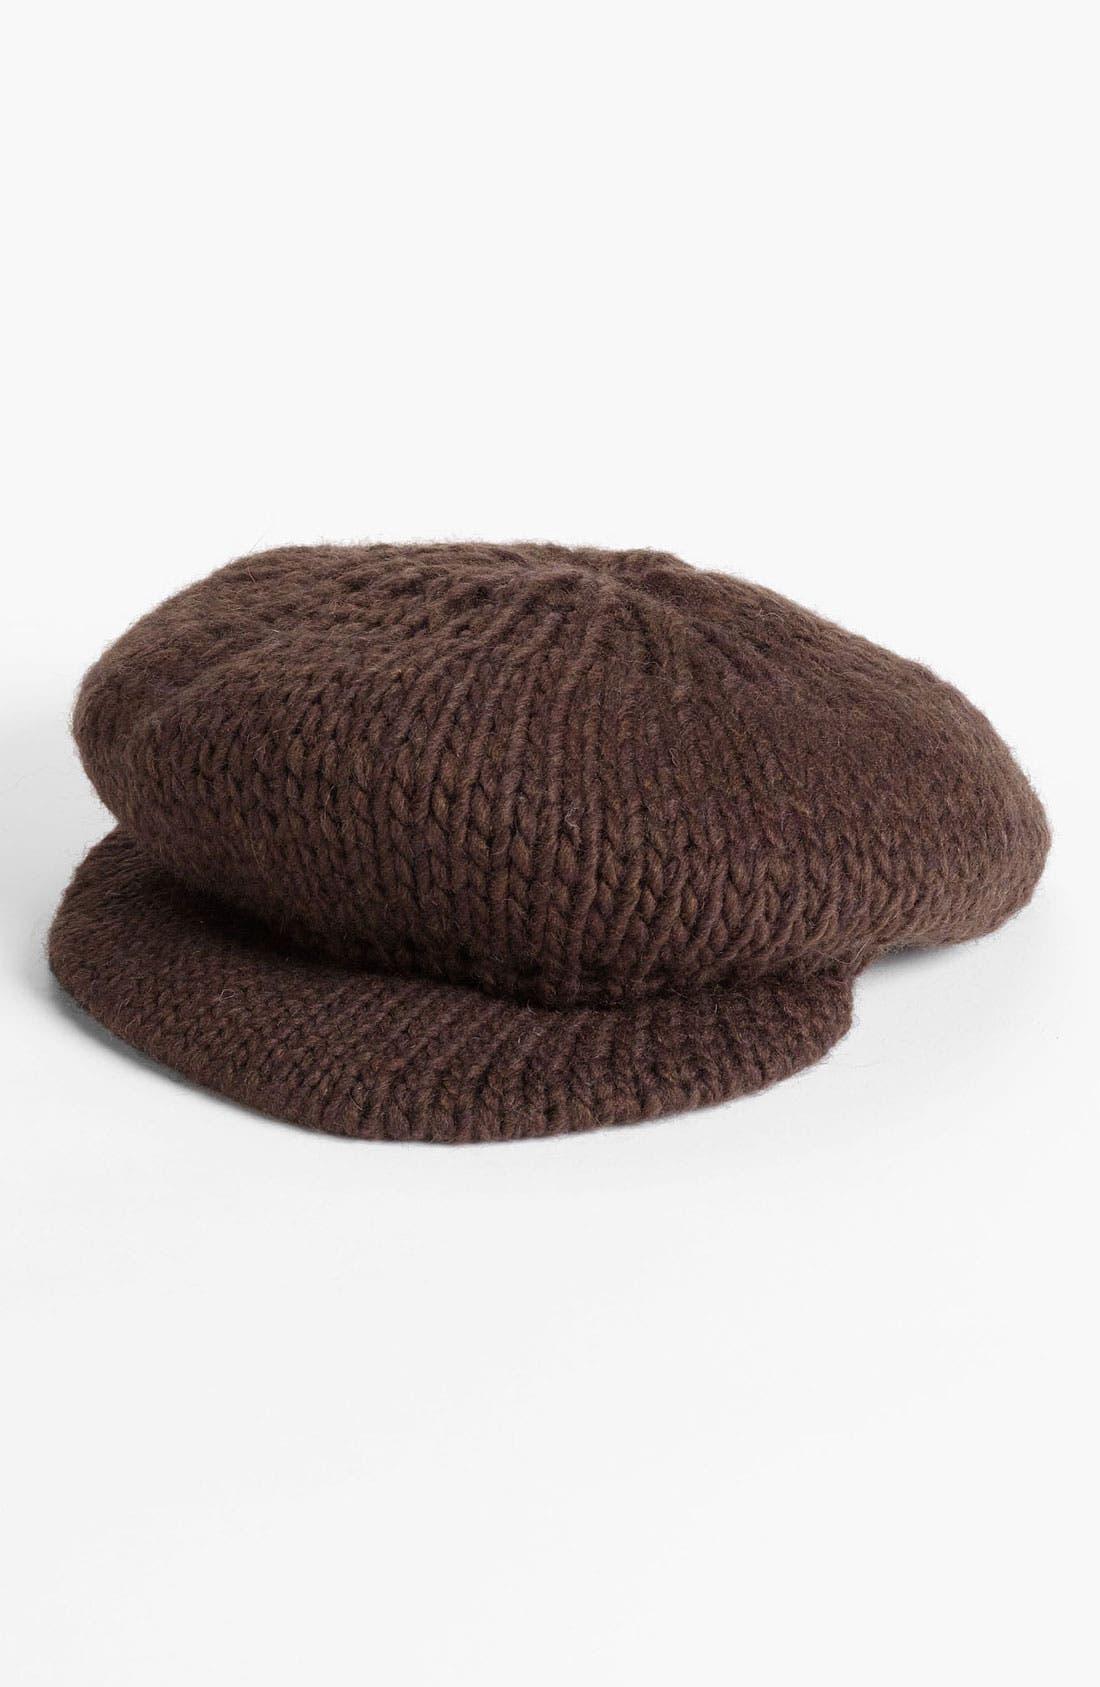 Alternate Image 1 Selected - Halogen® Knit Cap